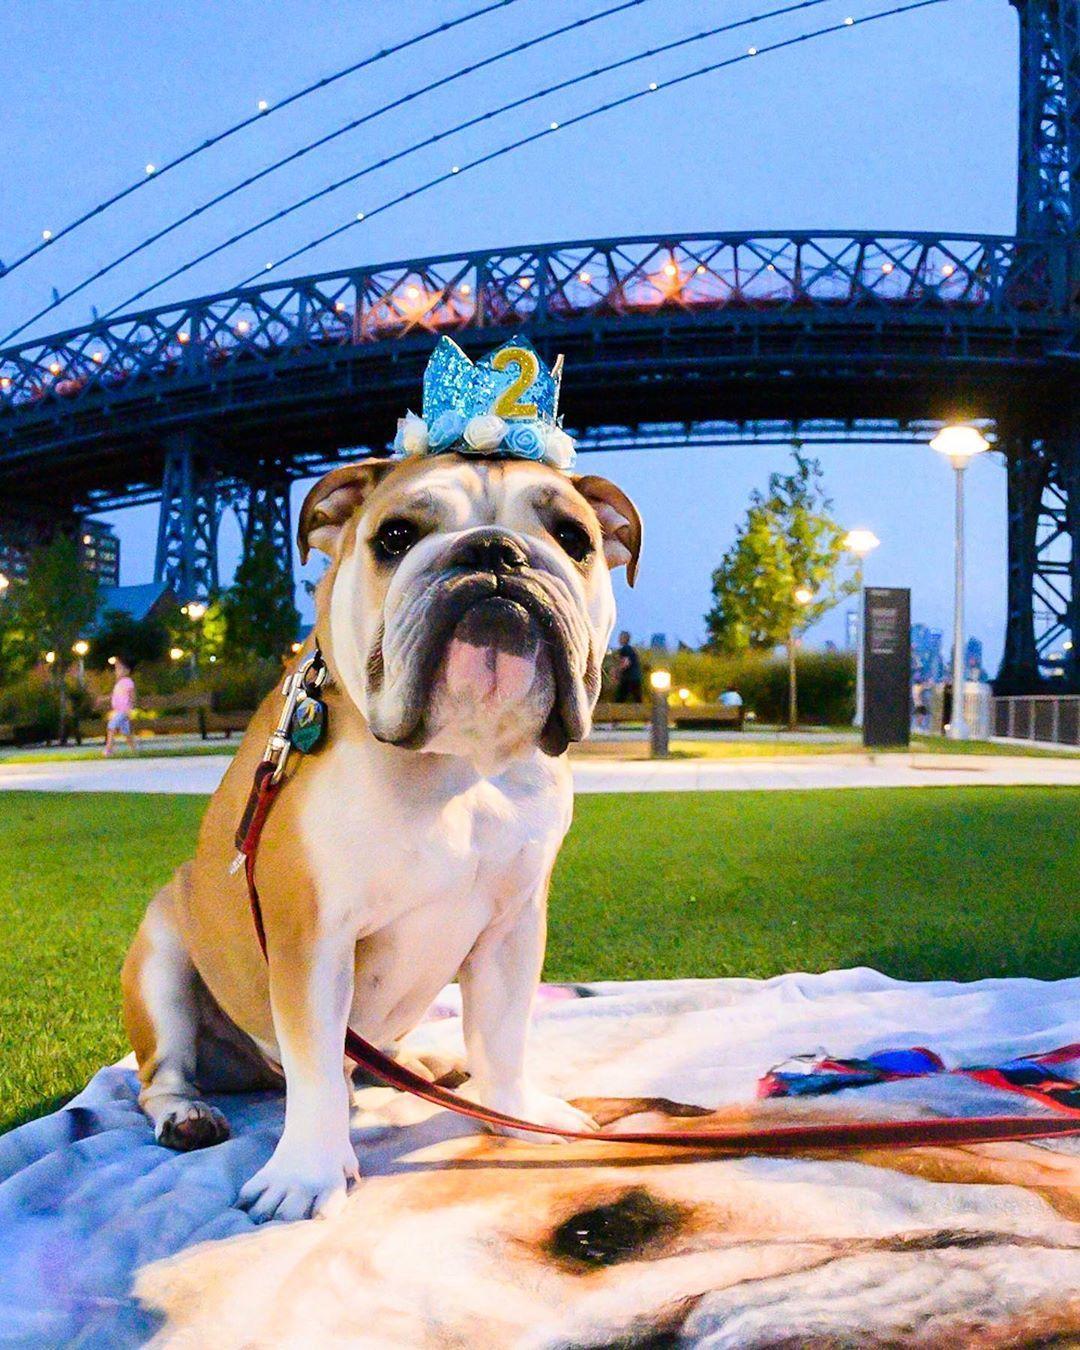 Hendrix English Bulldog 2 Y O Domino Park Brooklyn Ny He Just Turned Two He Has Many Fears Loud English Bulldog Dogs Animal Shelter